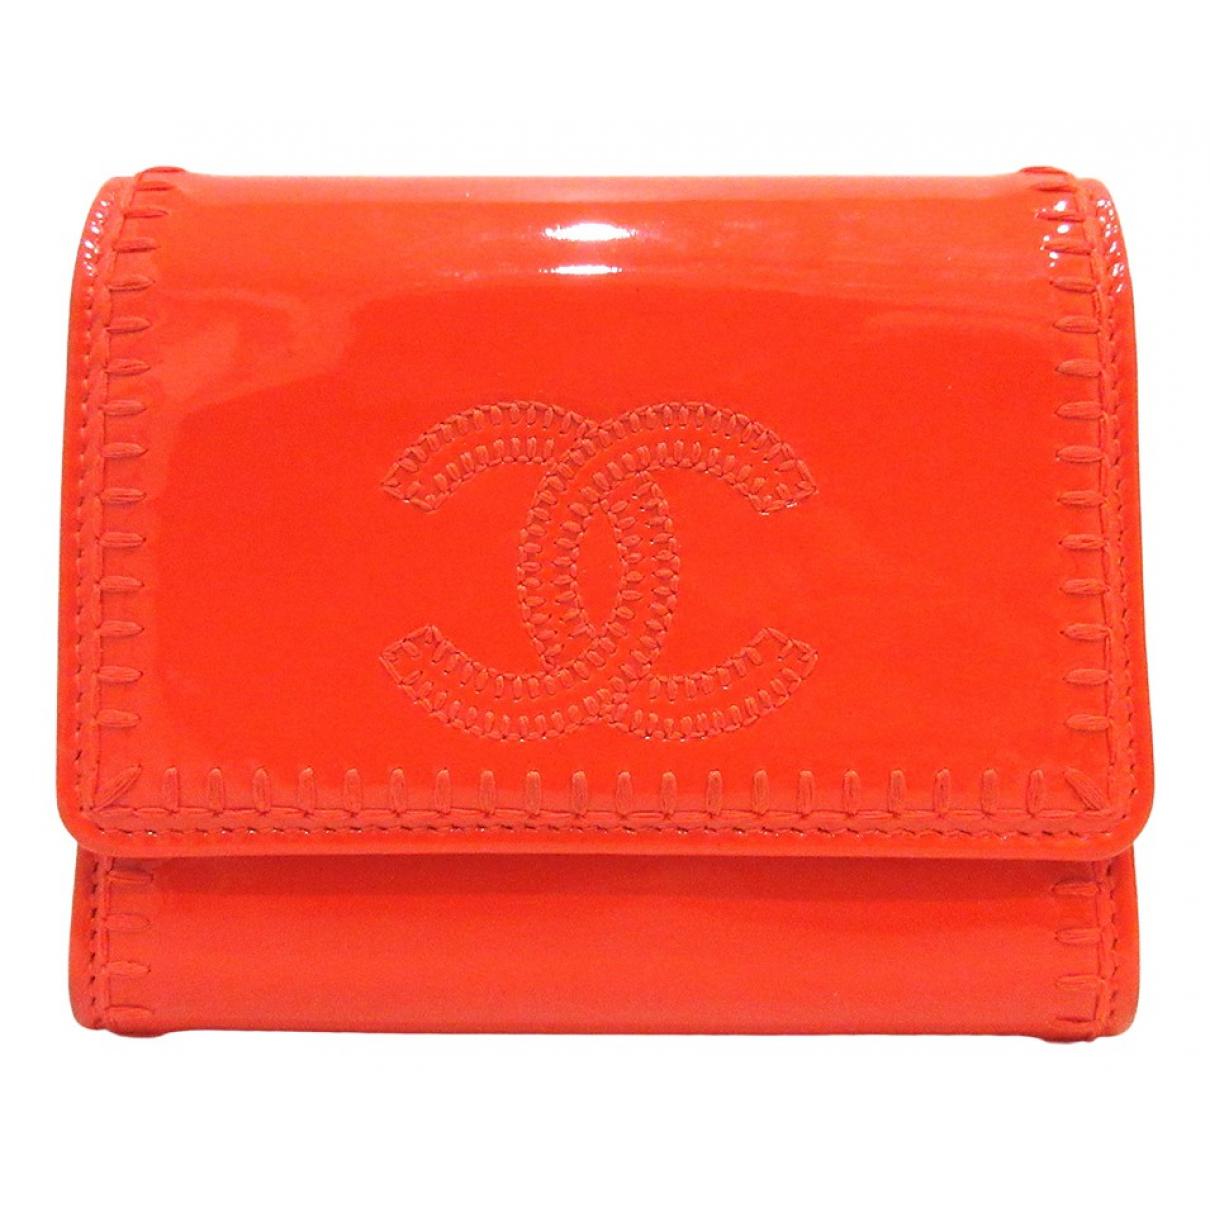 Chanel \N Portemonnaie in  Orange Leder